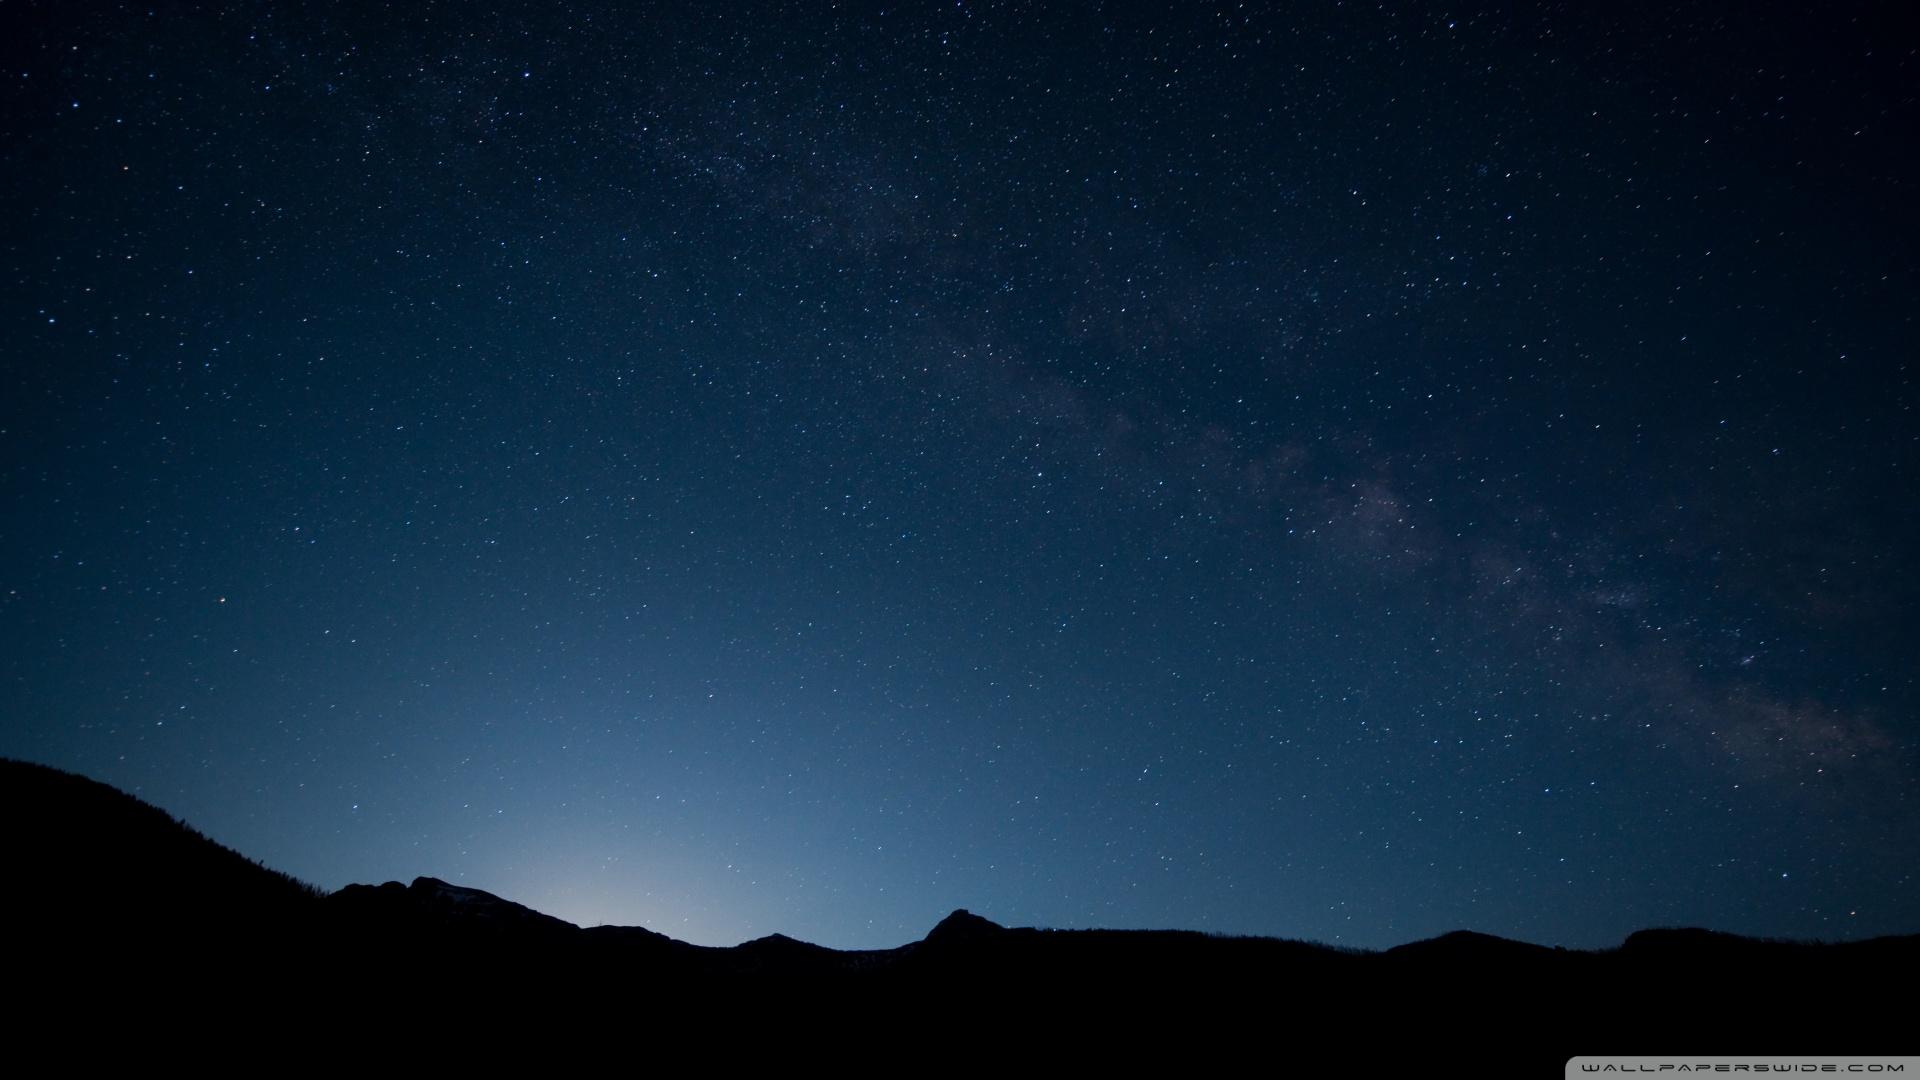 Night Sky Wallpaper   FREE DOWNLOAD HD WALLPAPERS 1920x1080